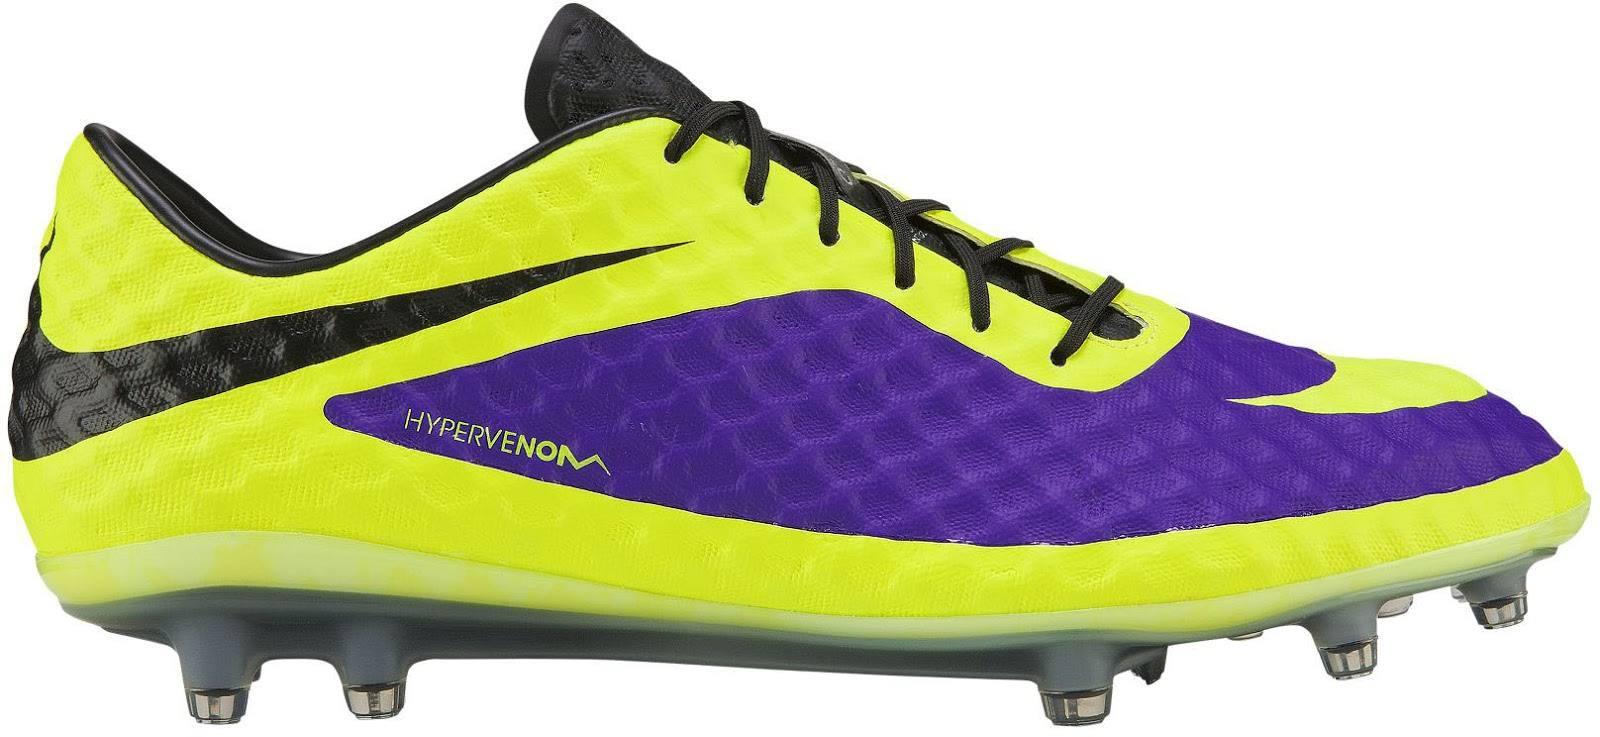 Nike hypervenom indoor